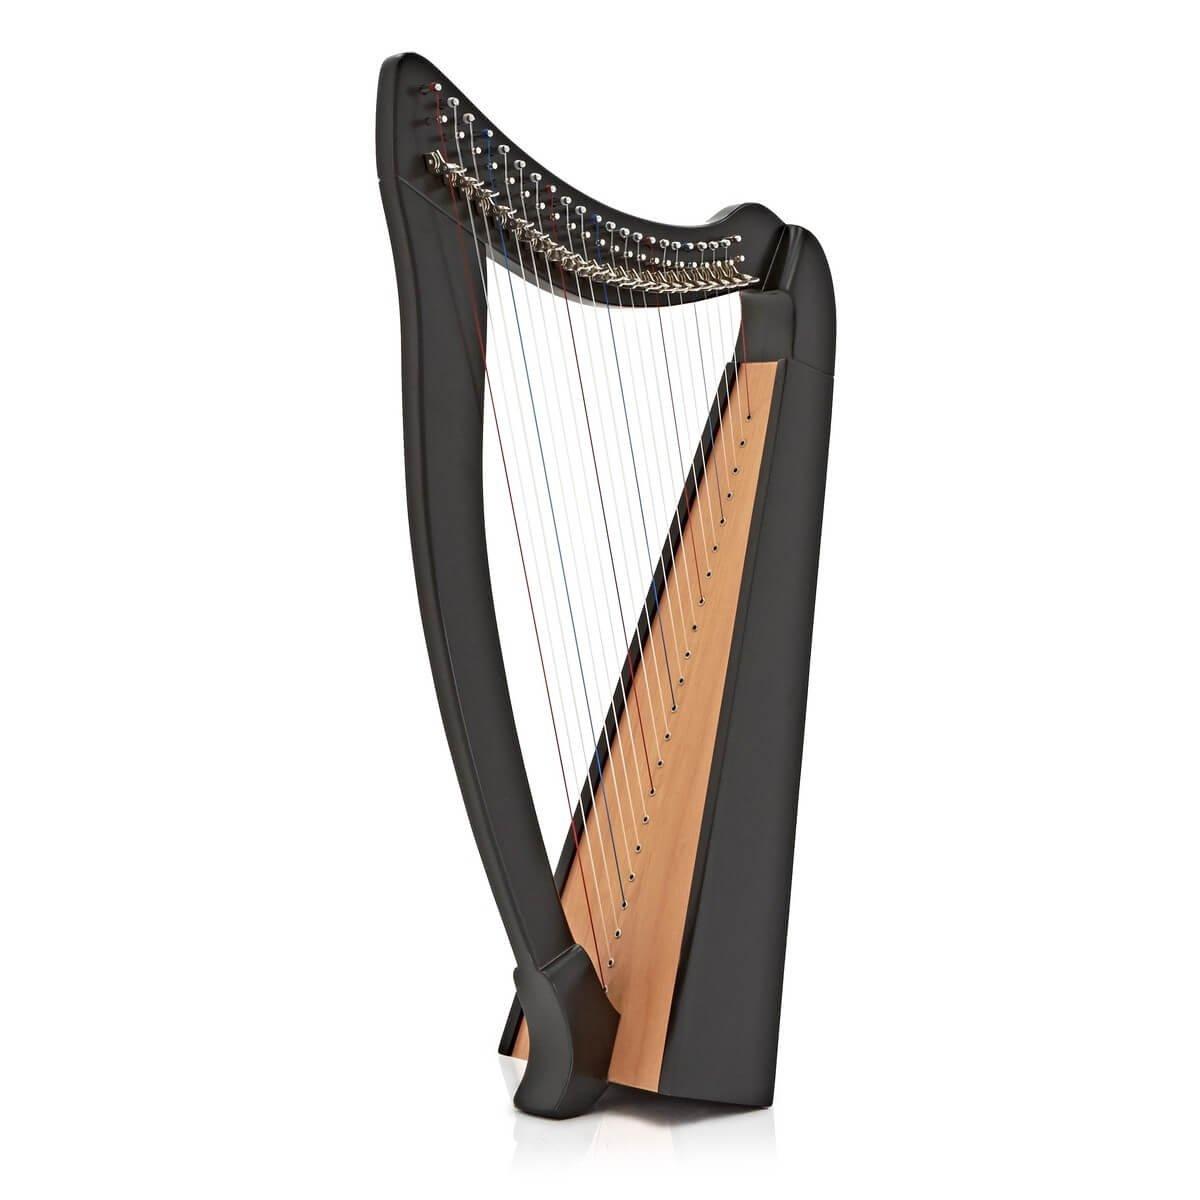 ROYAL HARPS Celtic Irish Lever Harp 22 Strings Free Deluxe Bag Extra Strings /& Tuning Key